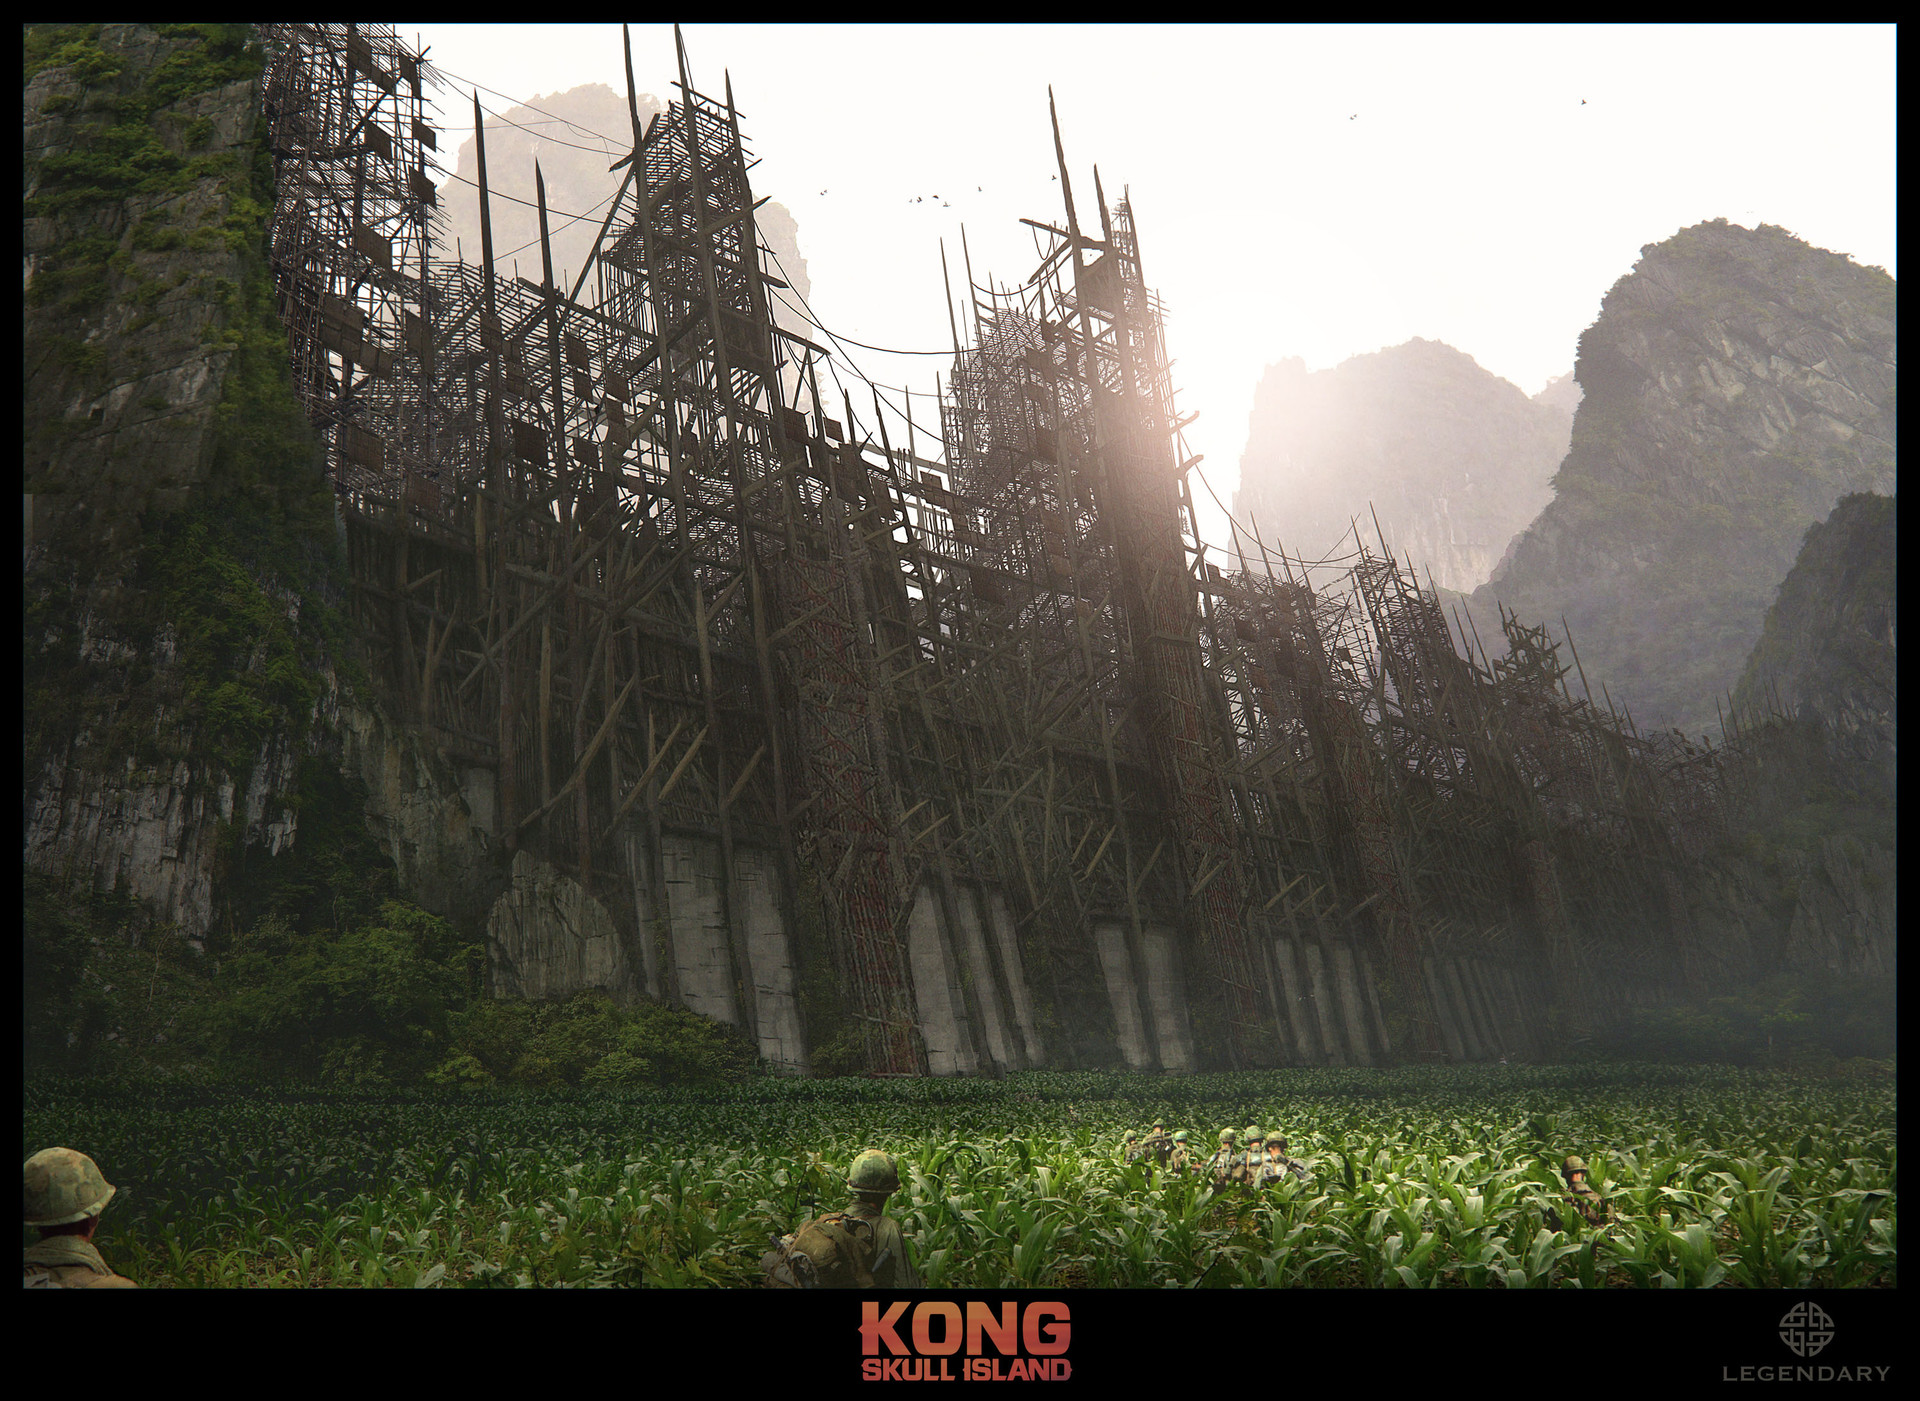 Kong: Skull Island Concept Art by Dennis Chan